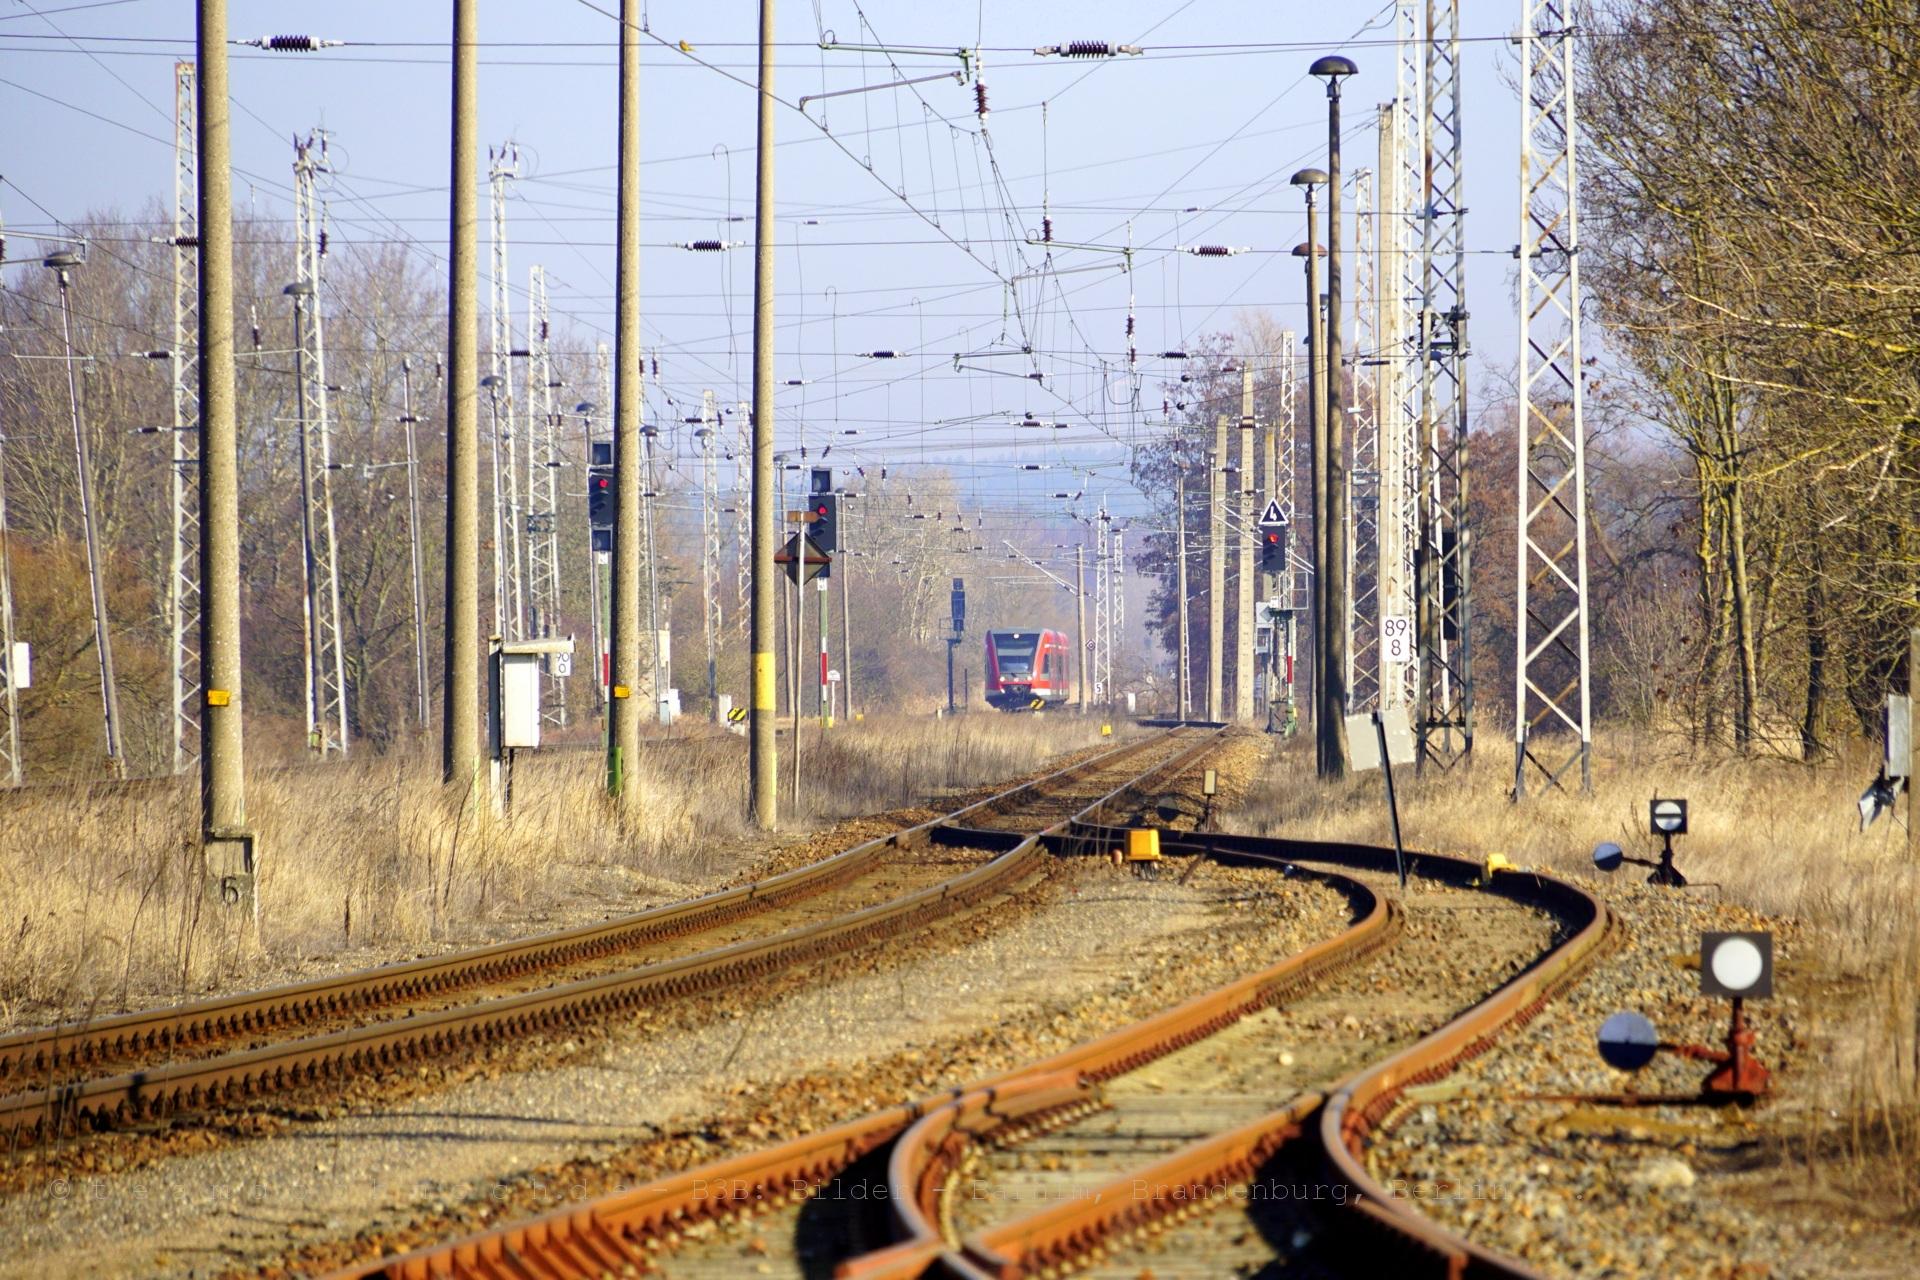 GTW 2/6 der DB AG aus Richtung Szczecin Główny kommt in den Bahnhof Passow